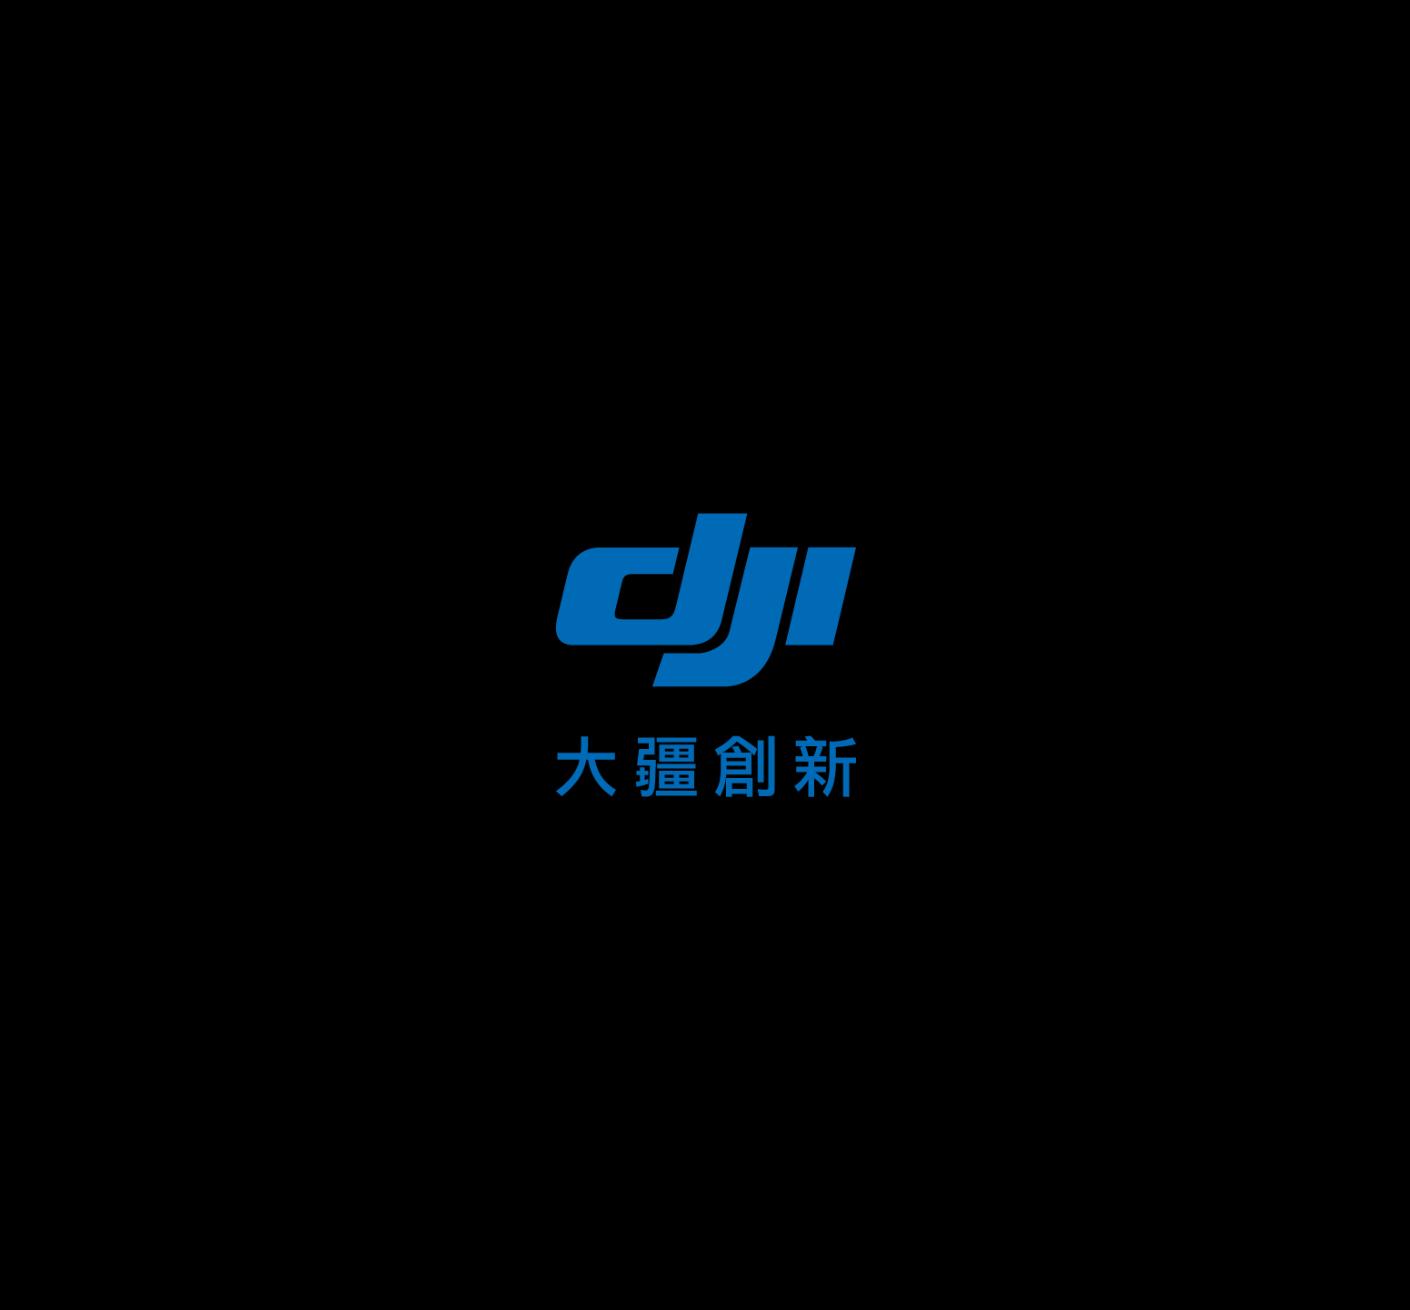 dji_logo_black